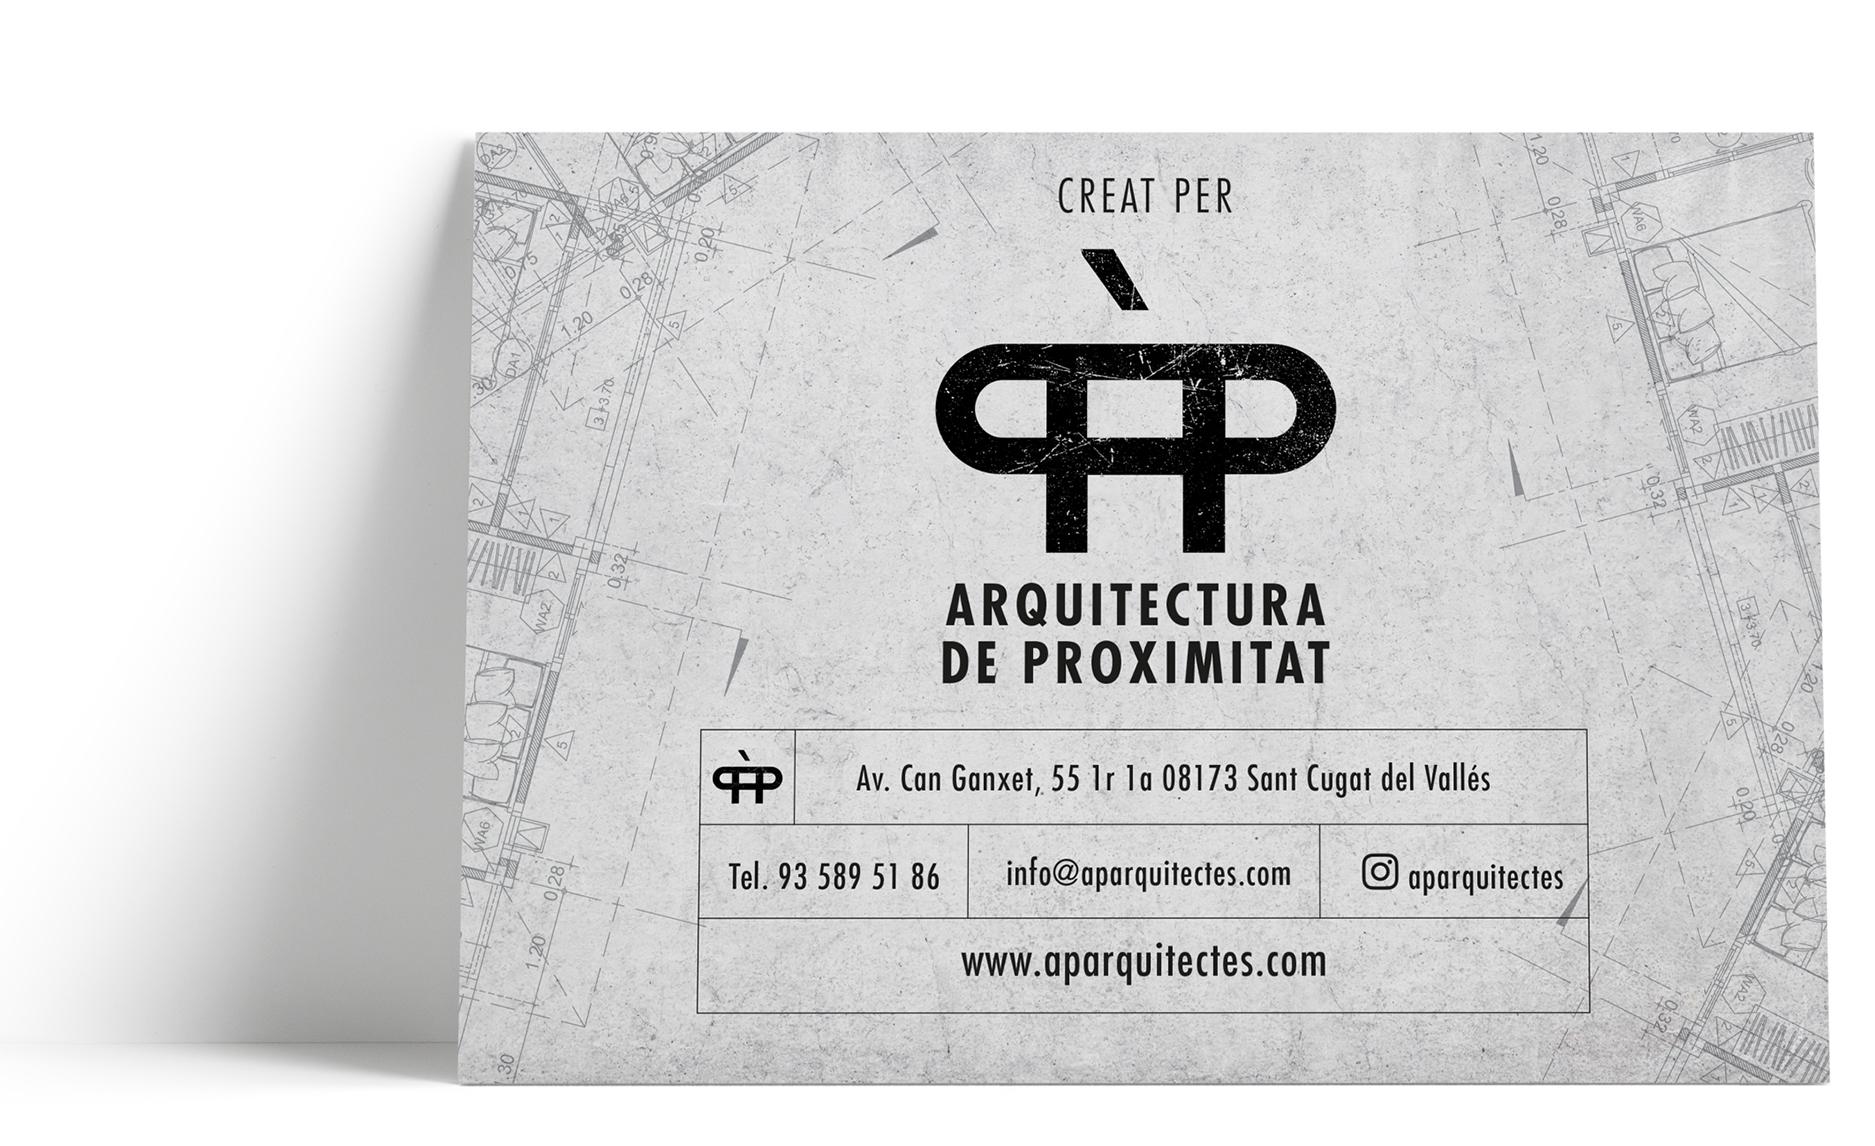 AP_Arqutiectes5.jpg